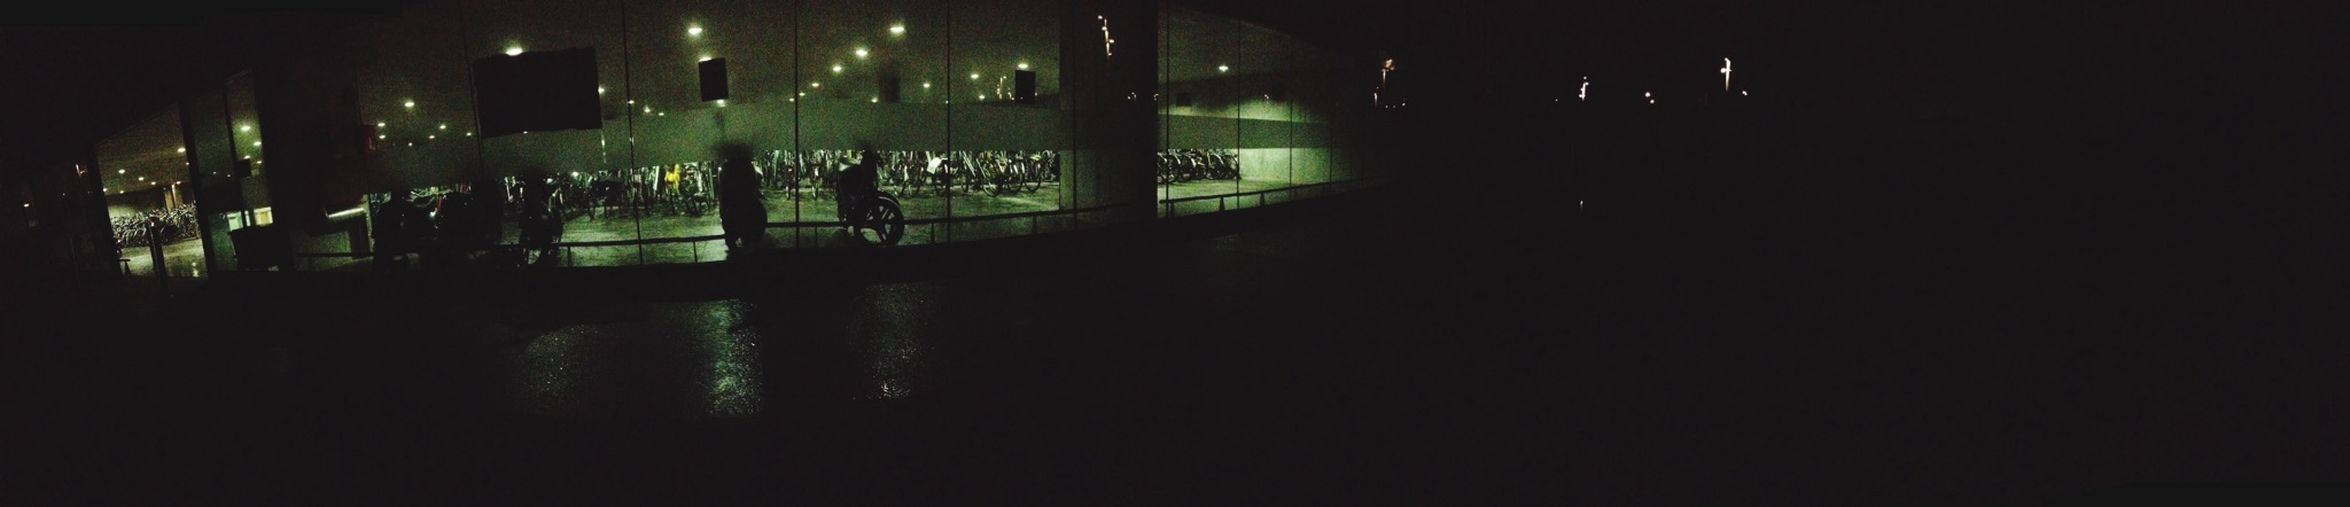 Late night talks with my friend Bruges Night Dark Bikes Friend